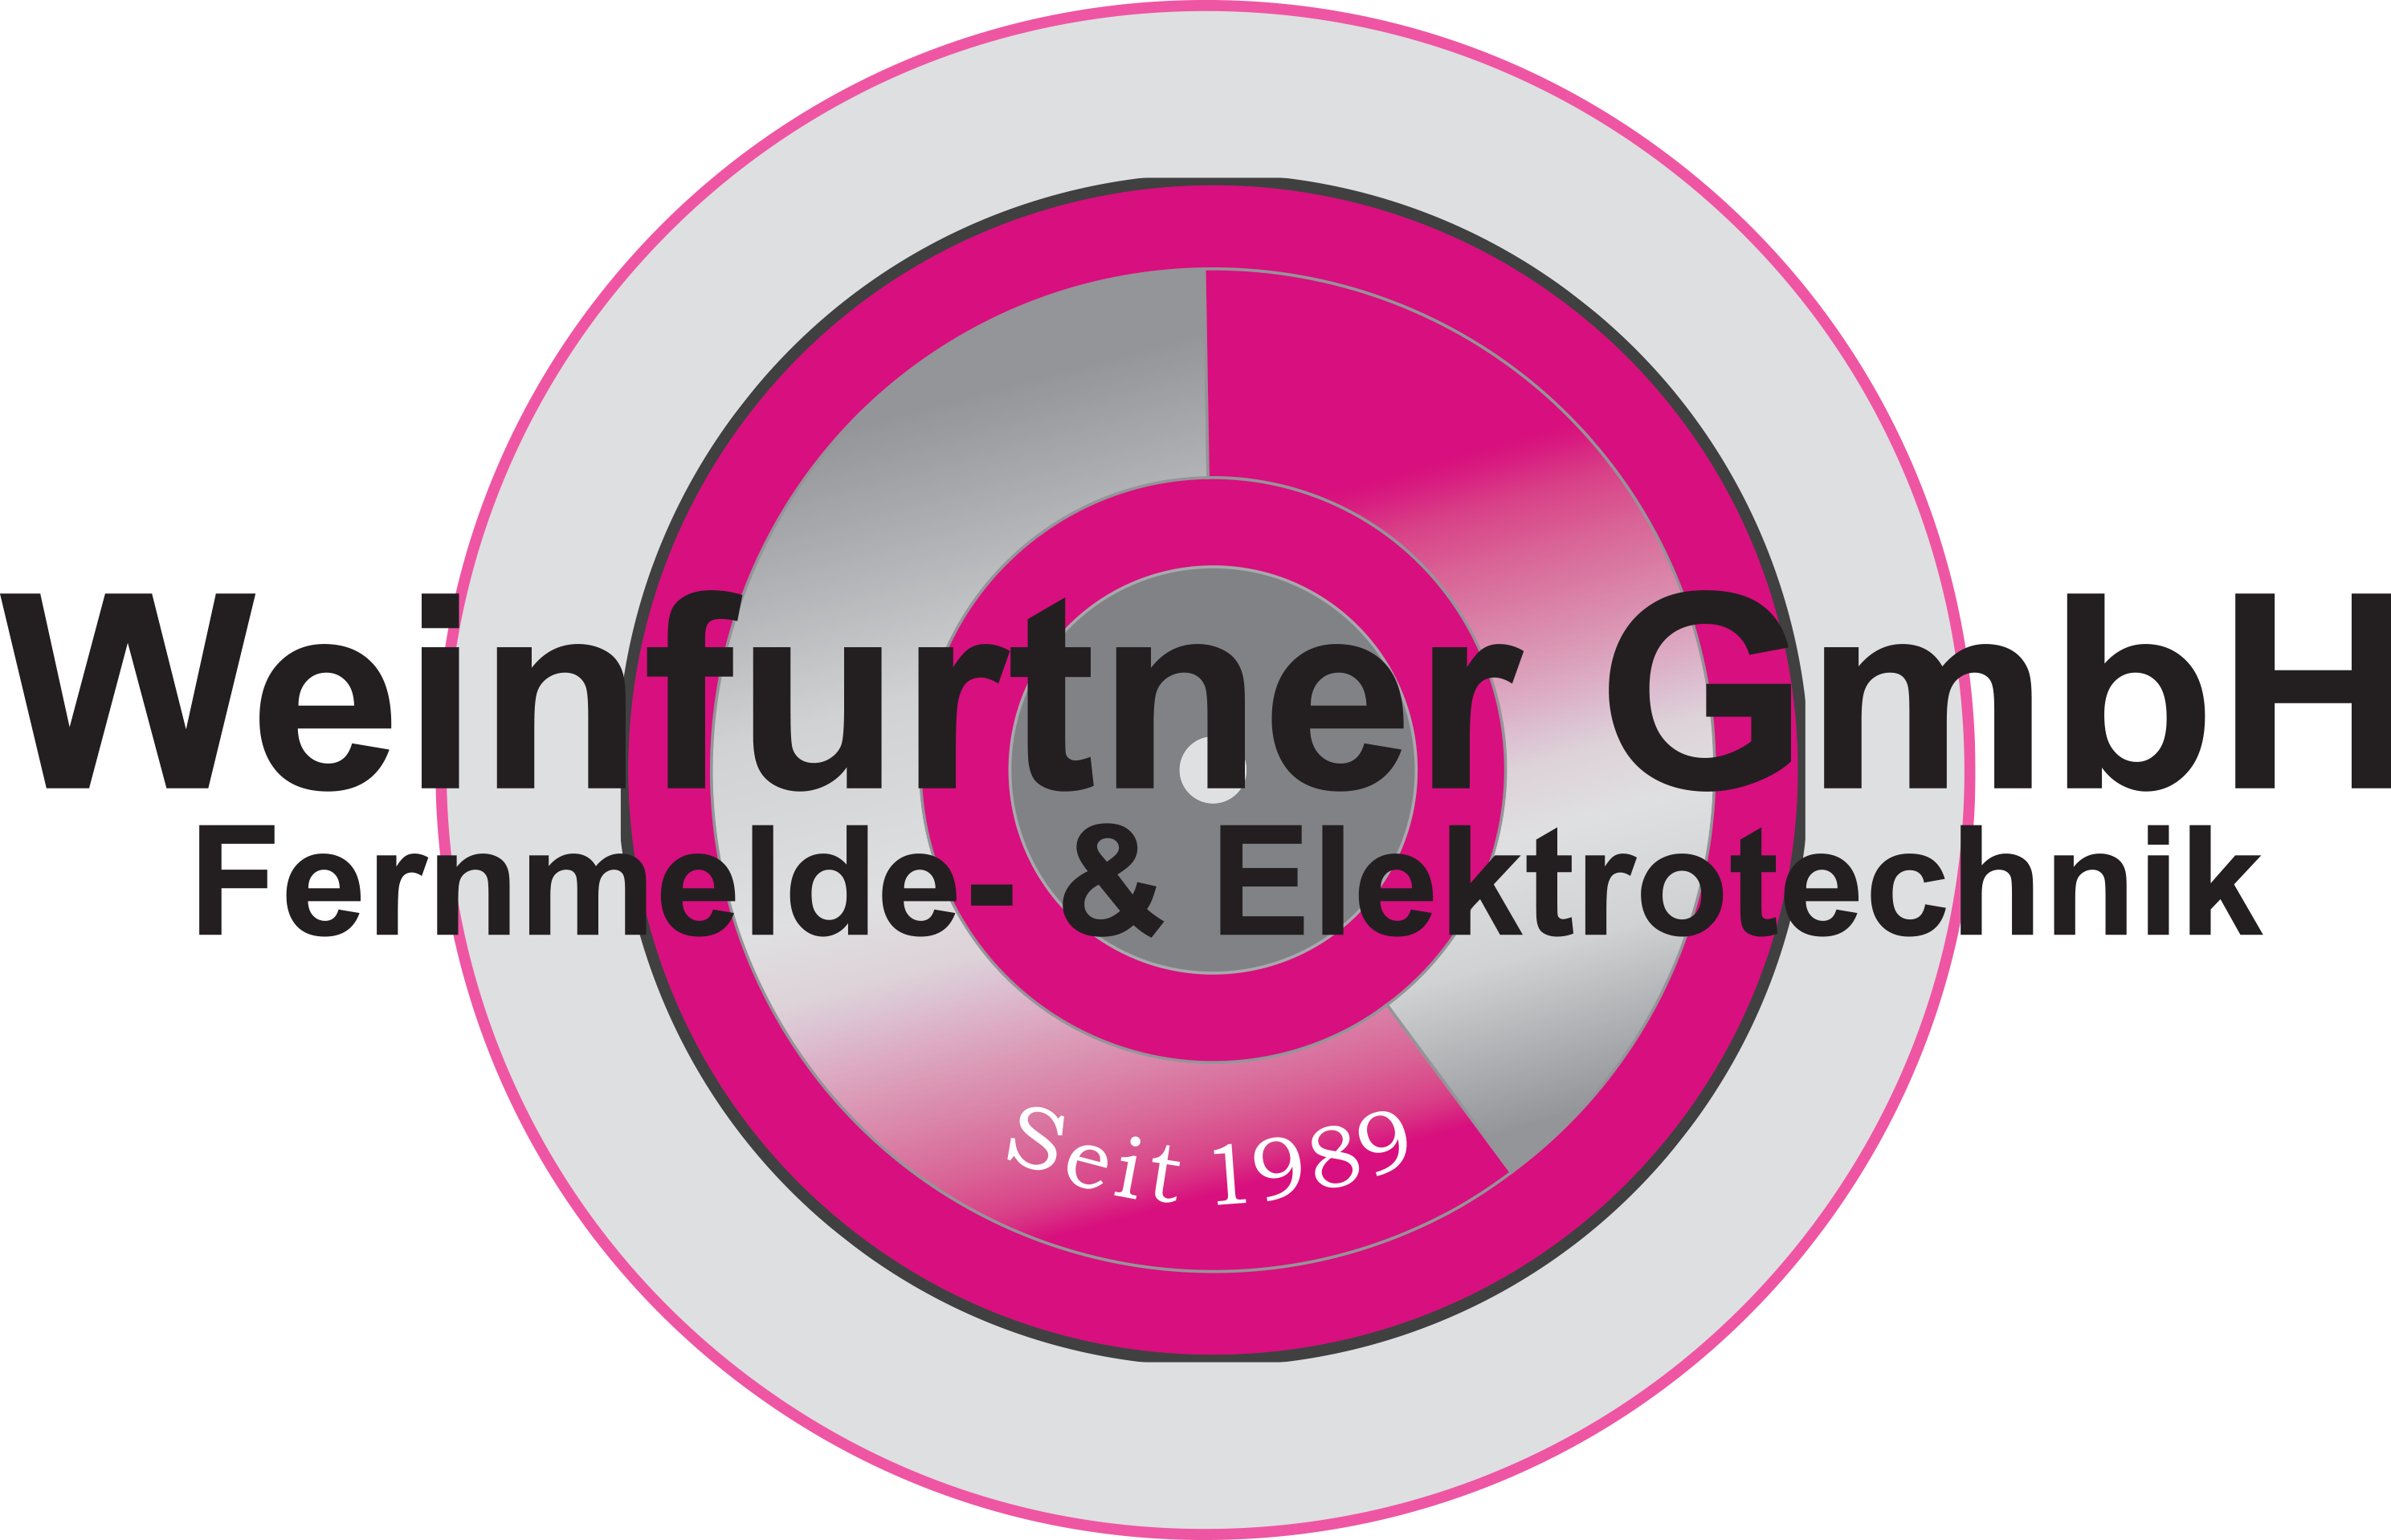 Weinfurtner GmbH